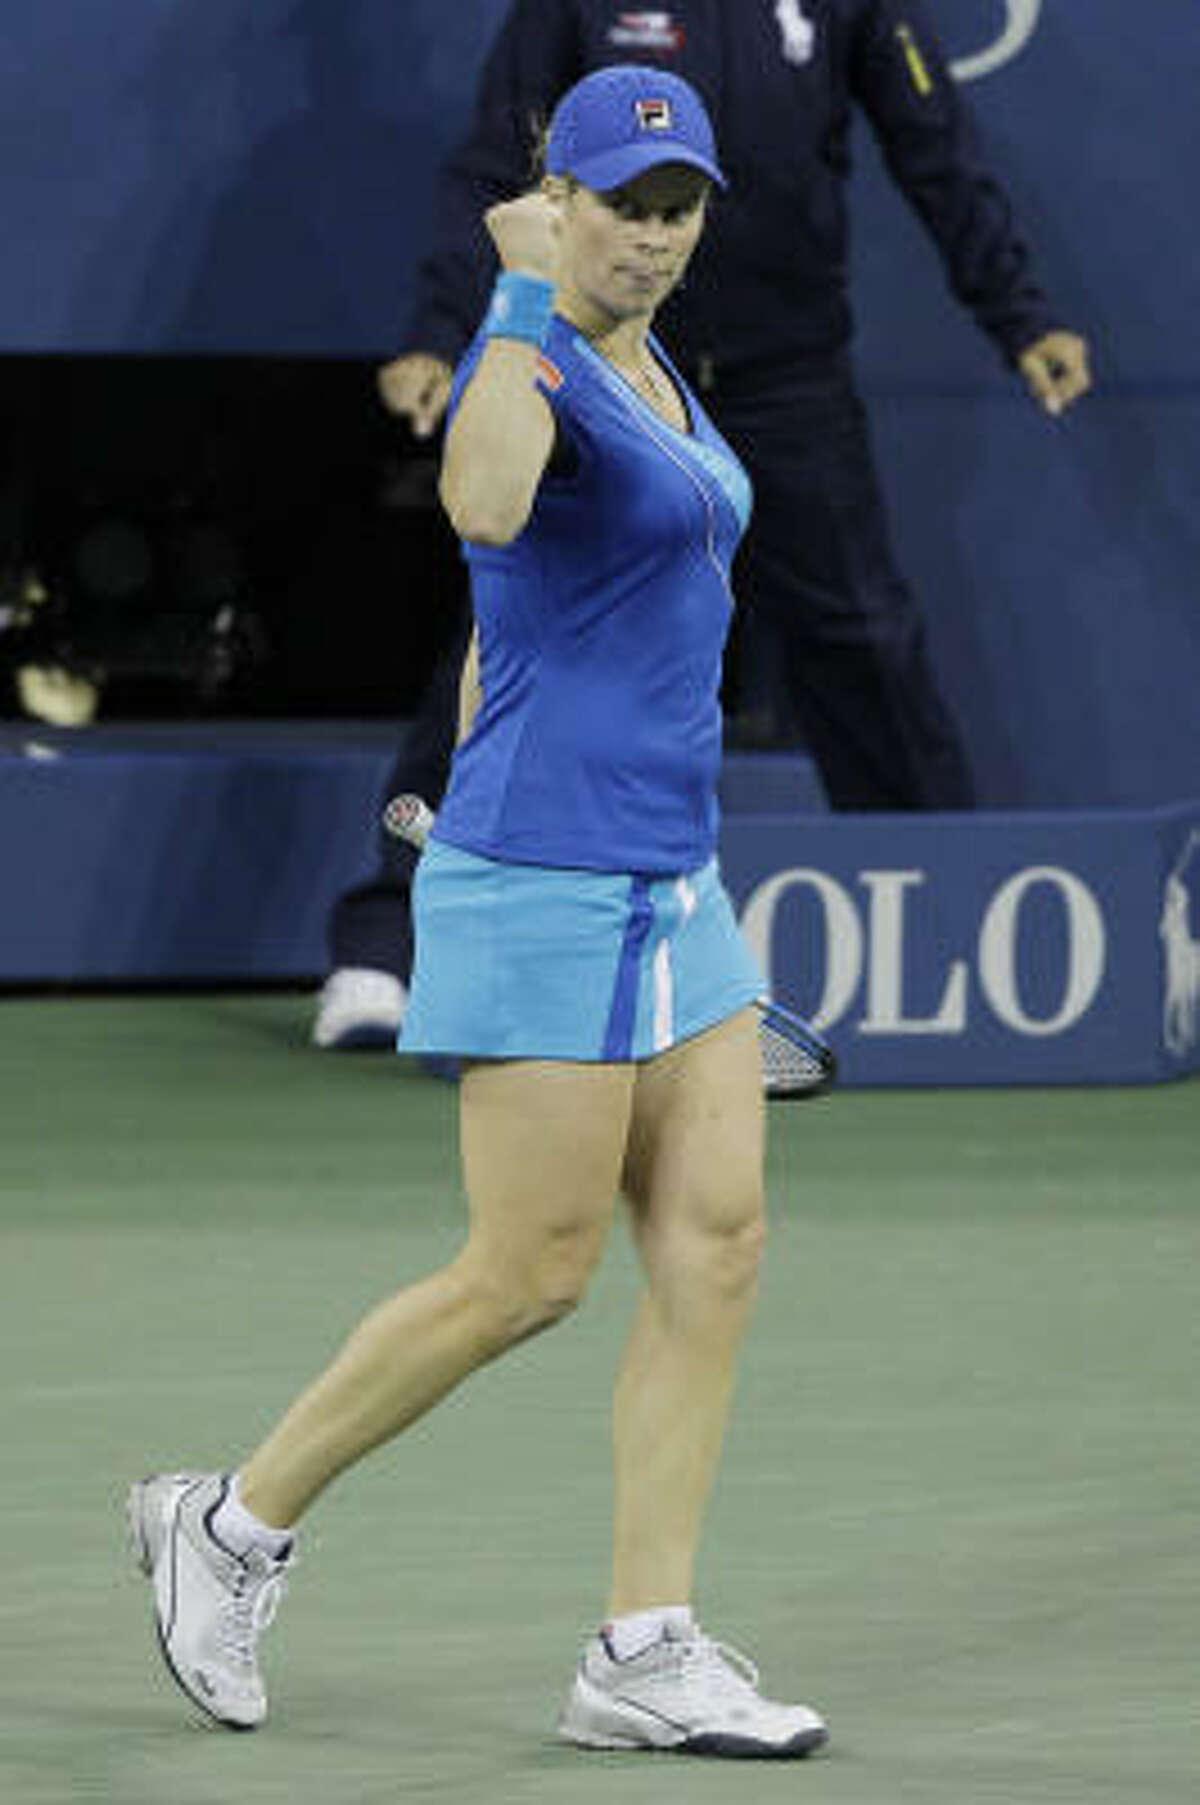 Kim Clijsters reacts during her match against Vera Zvonareva.